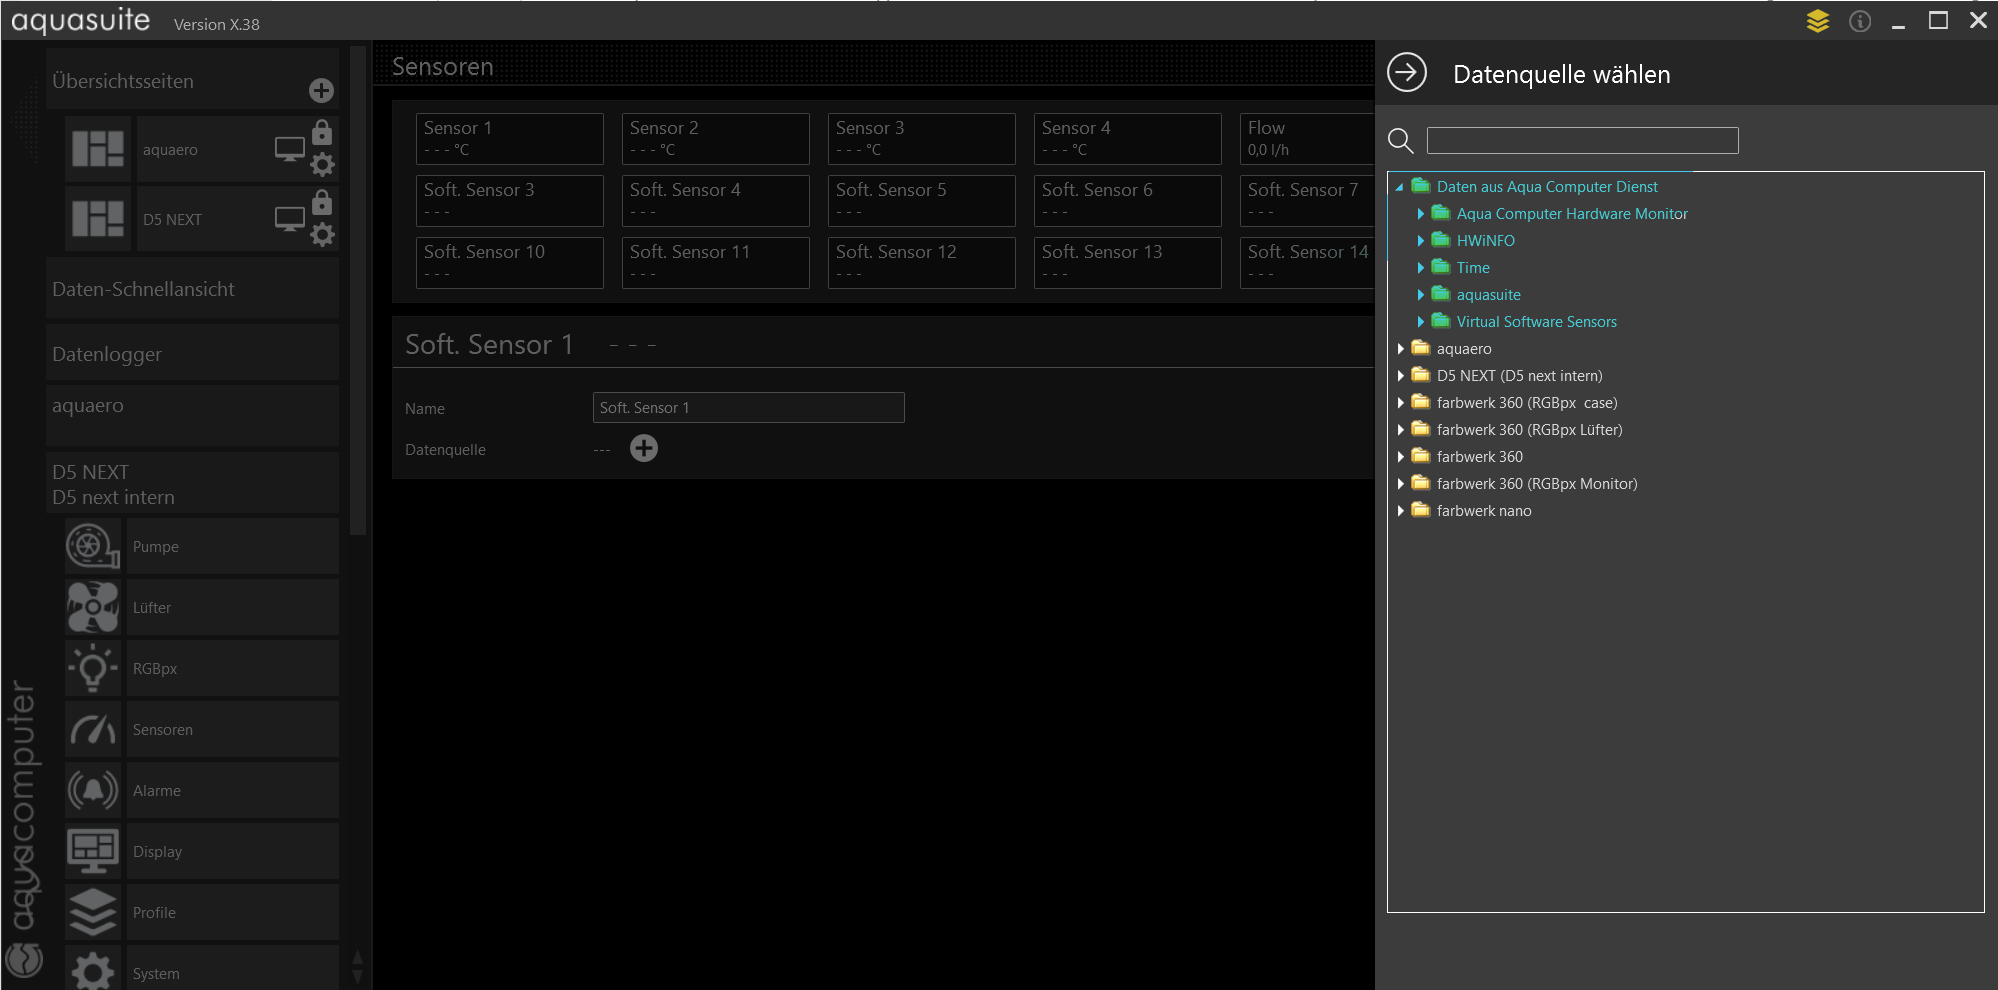 Screenshot 2021-03-02 230016.png